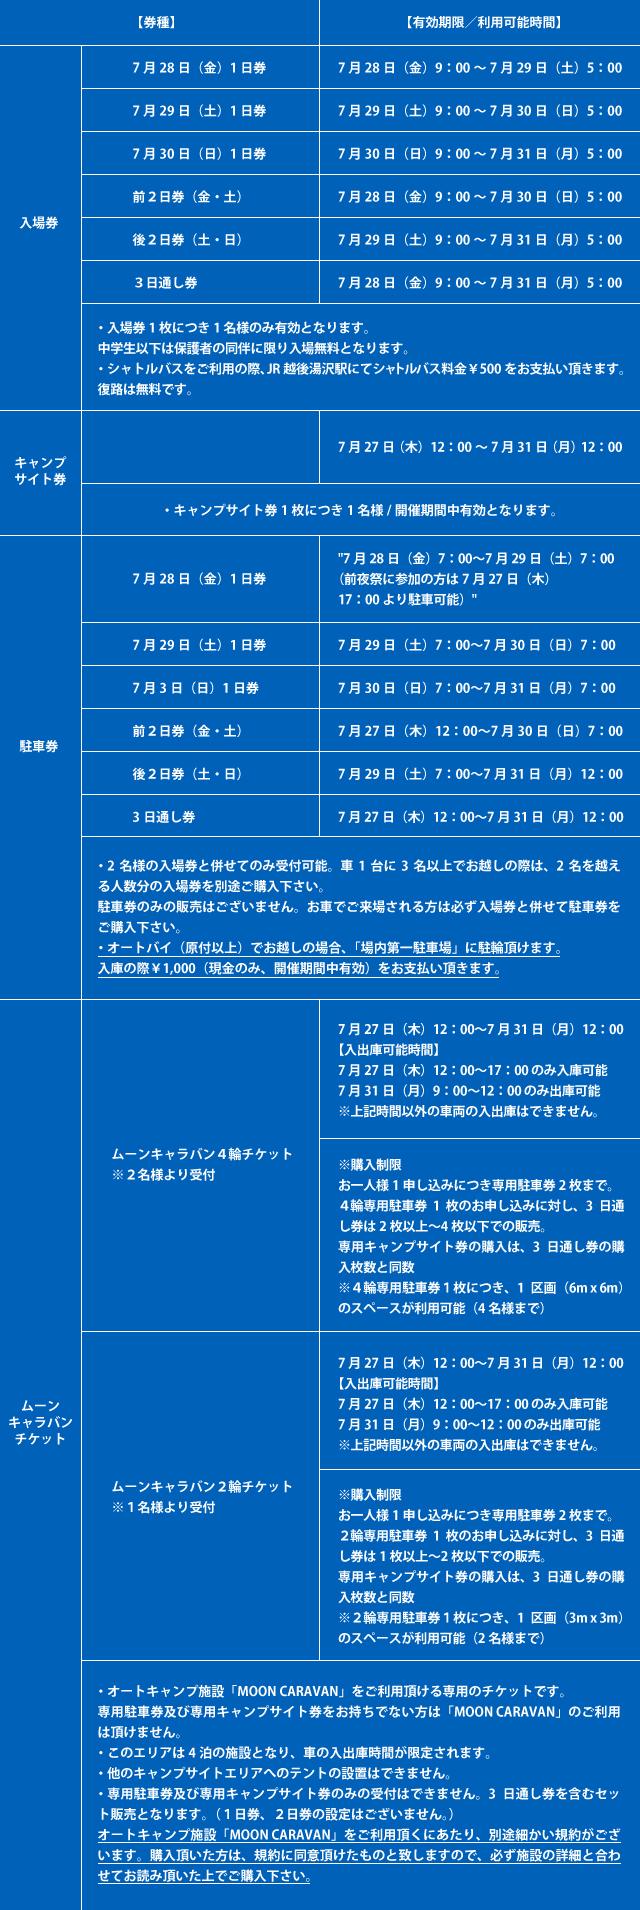 fuji-17-005